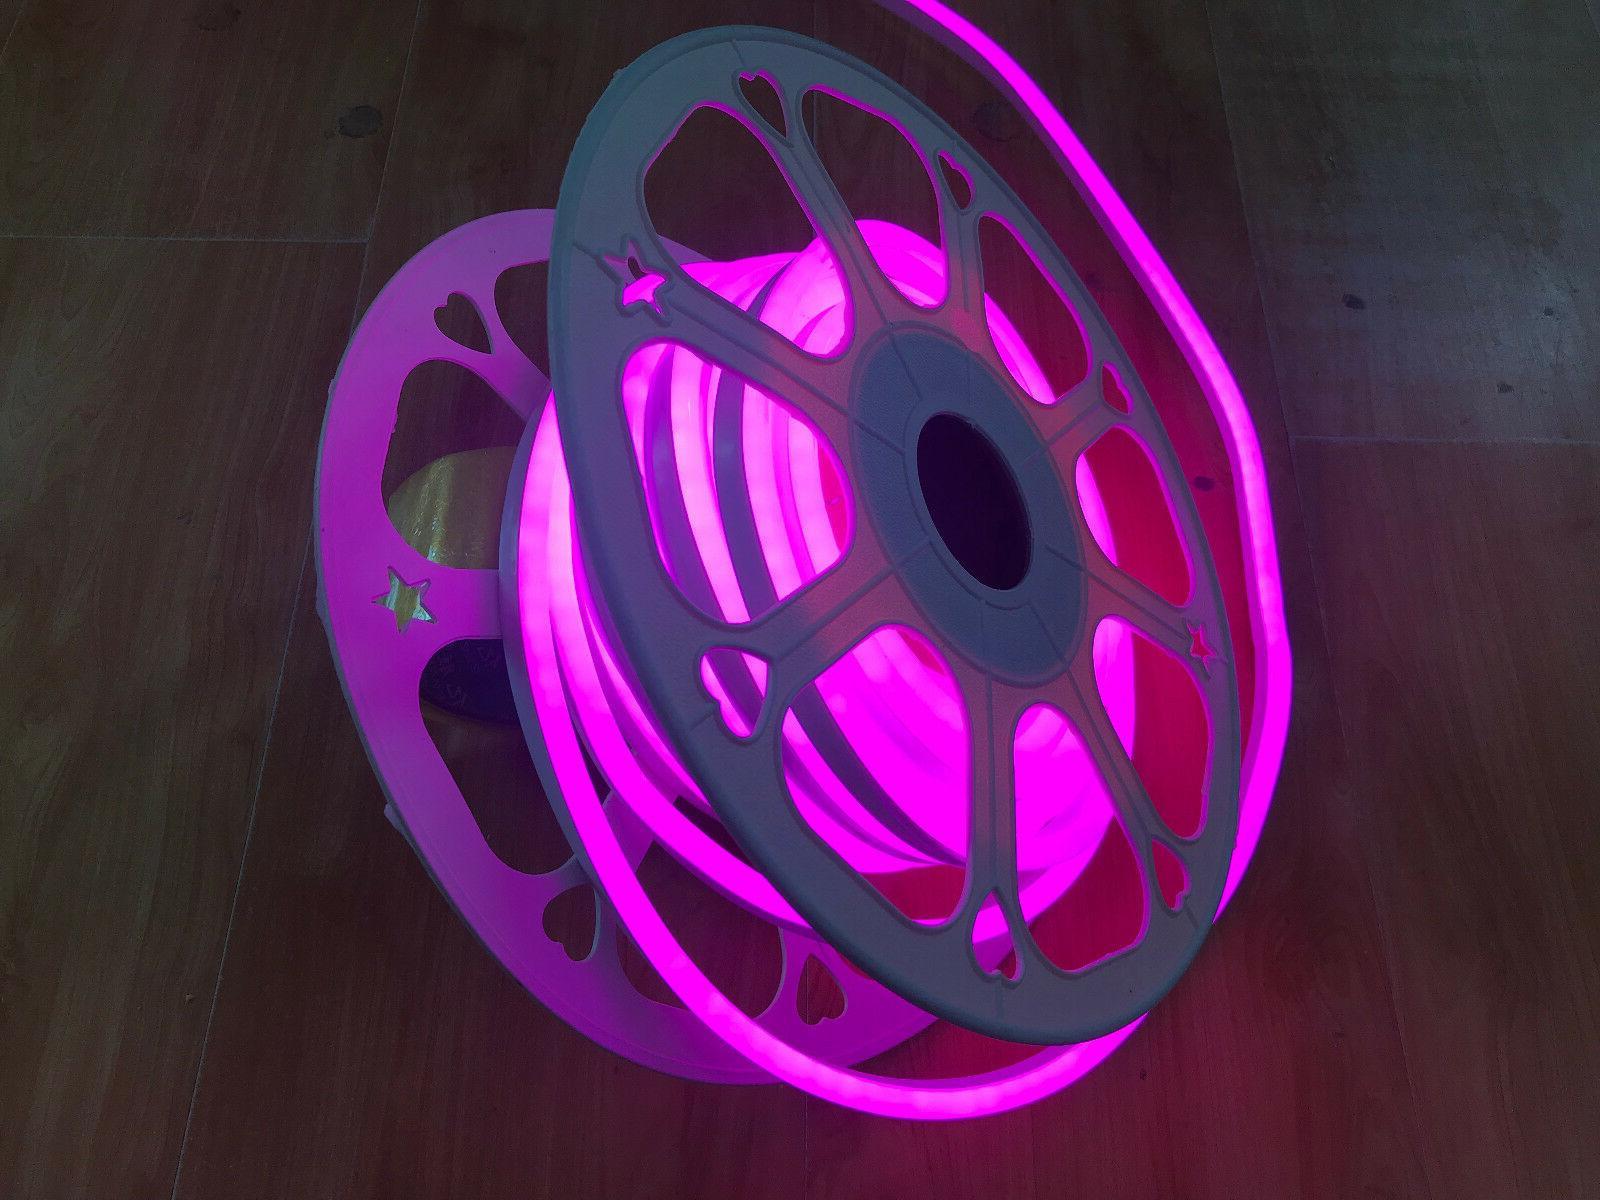 150' Neon Light Tube KTV Commercial DIY Sign Decor Outdoor